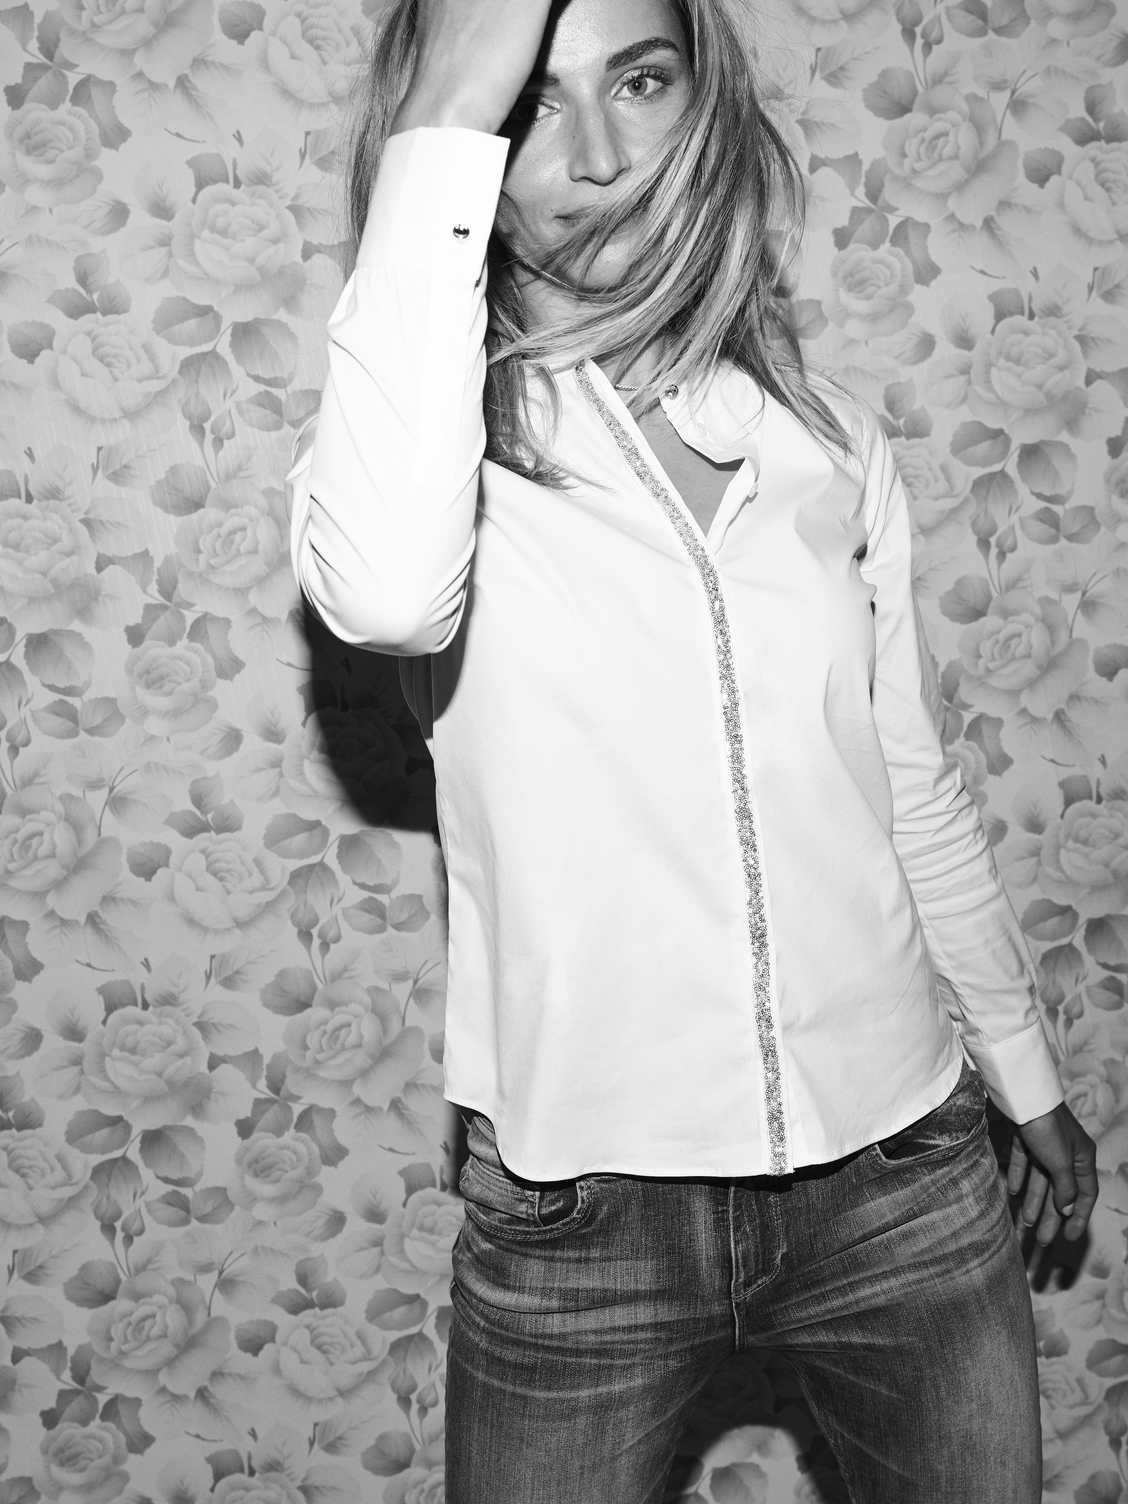 124510 124700 - Bradford Ida Jeans Maggie Shine Shirt - Campaign2.jpg